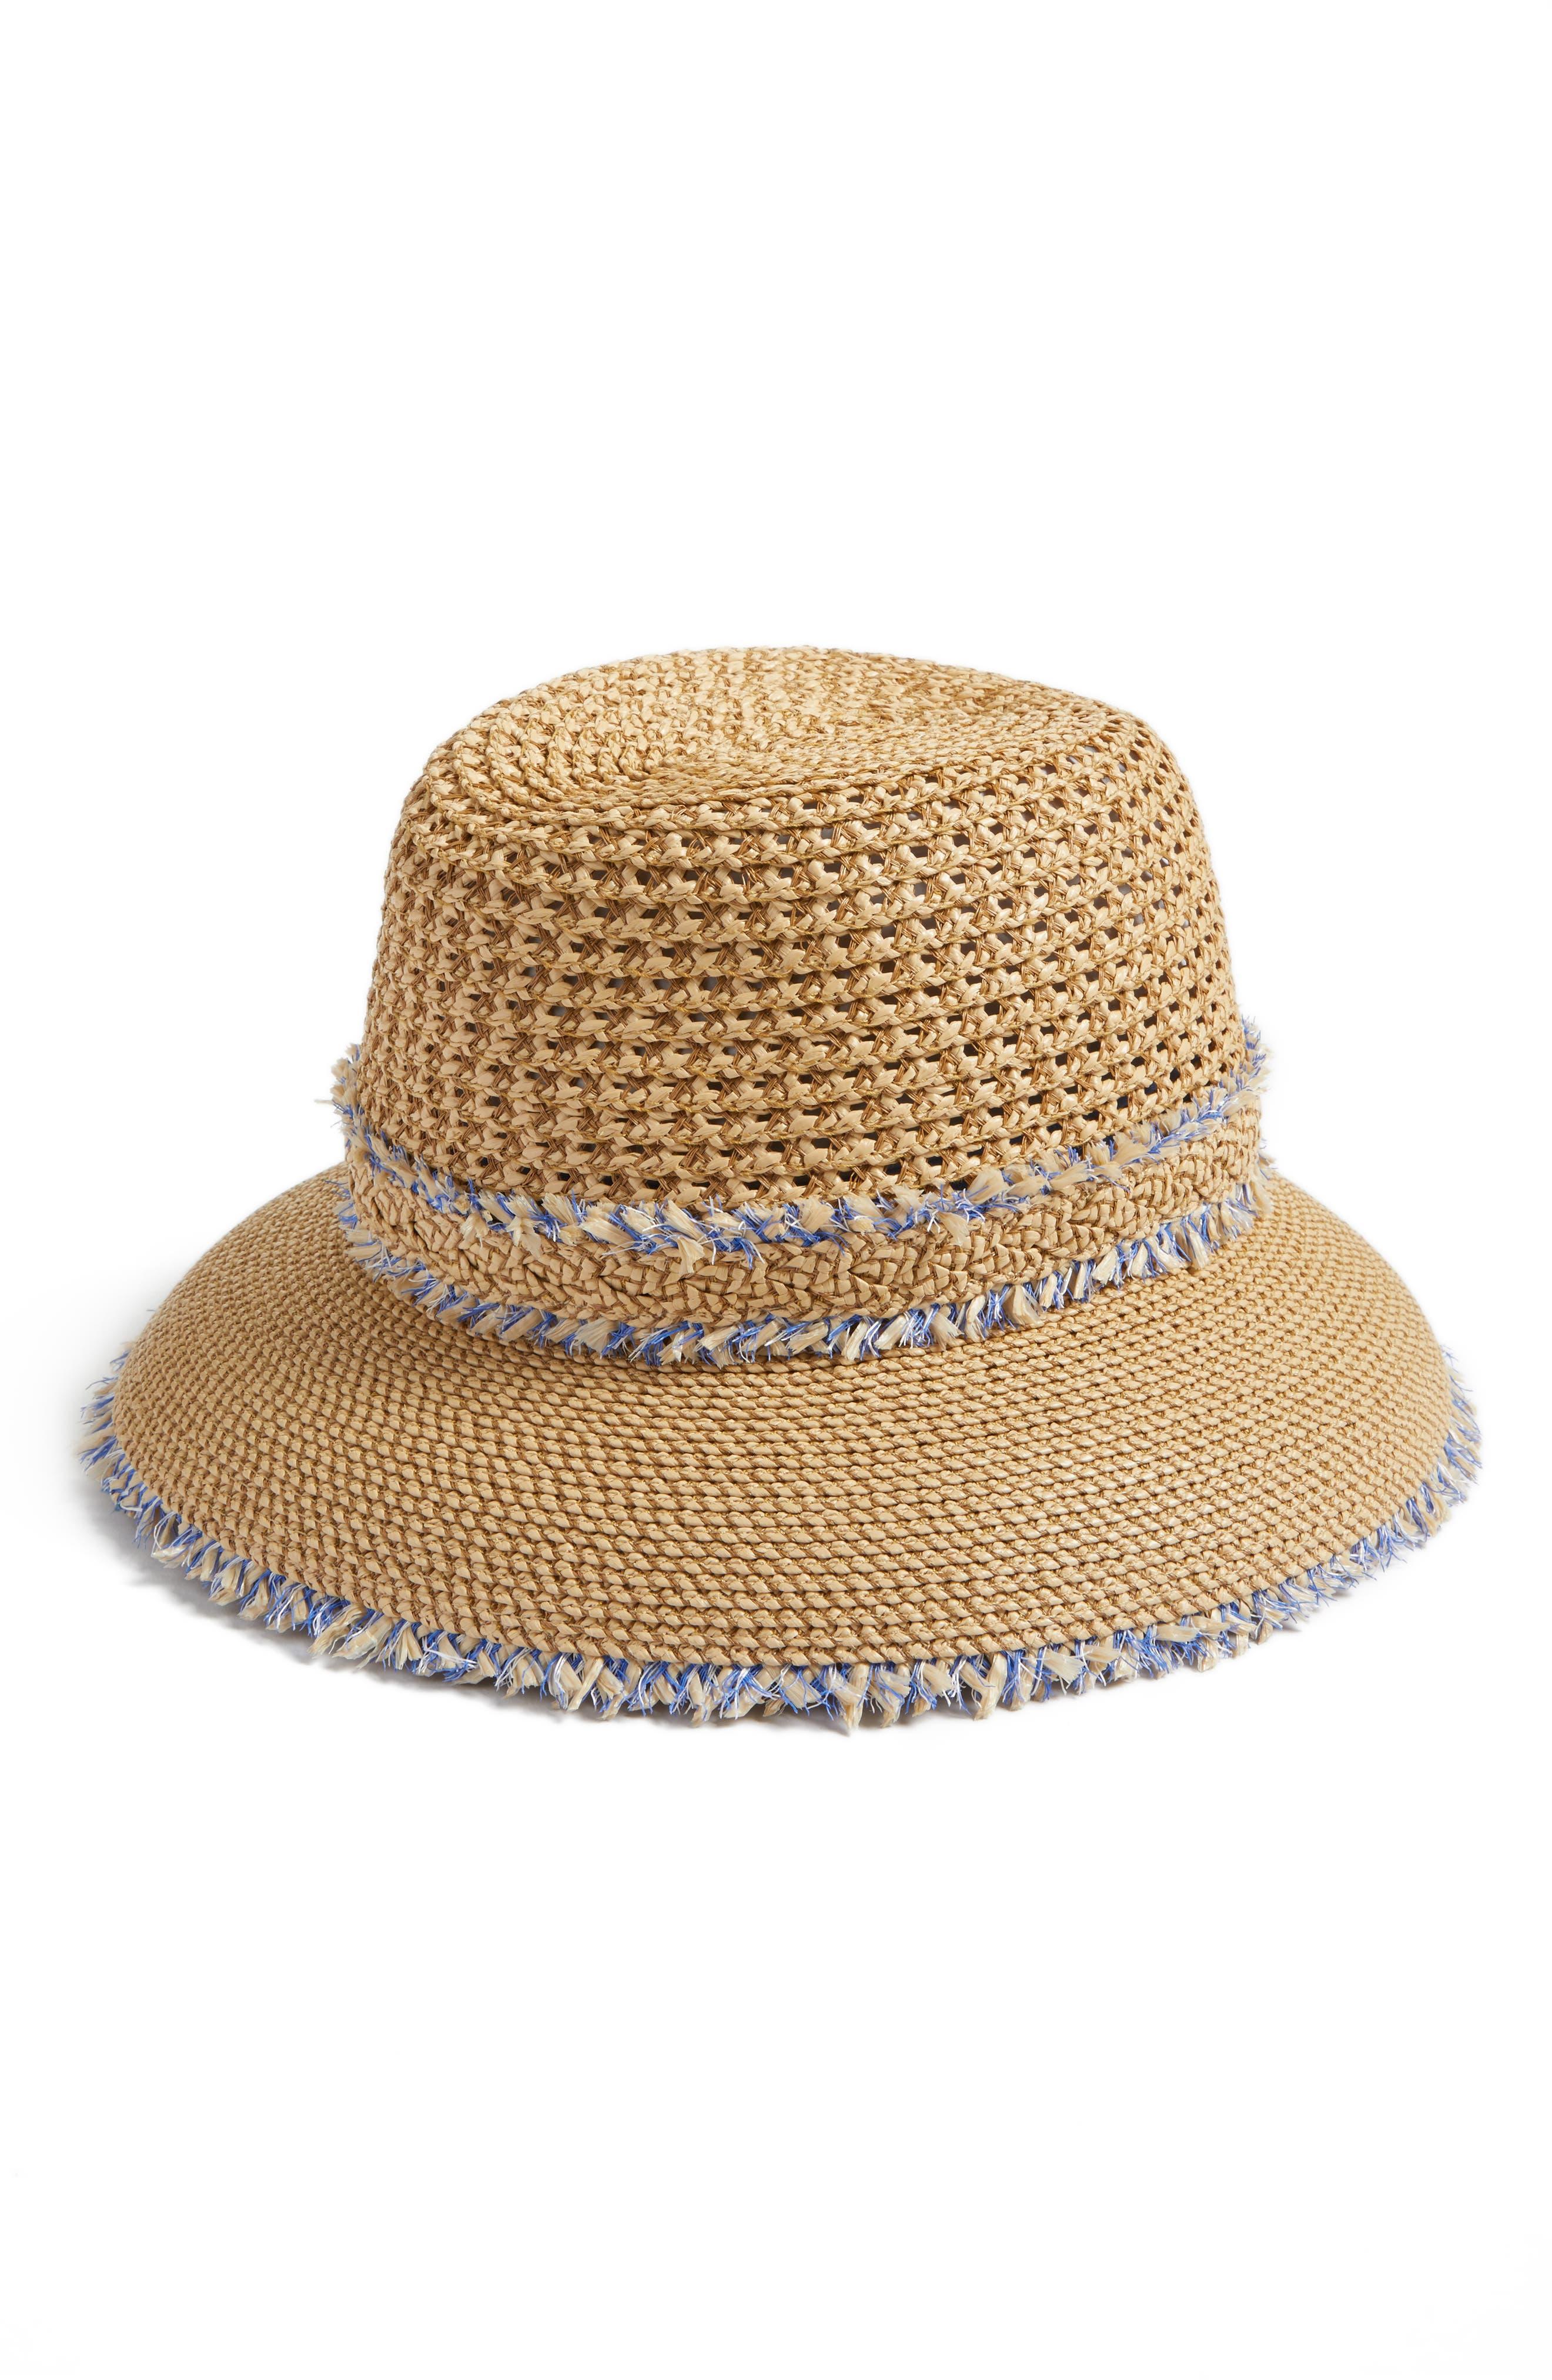 Eric Javits Lulu Squishee® Straw Hat